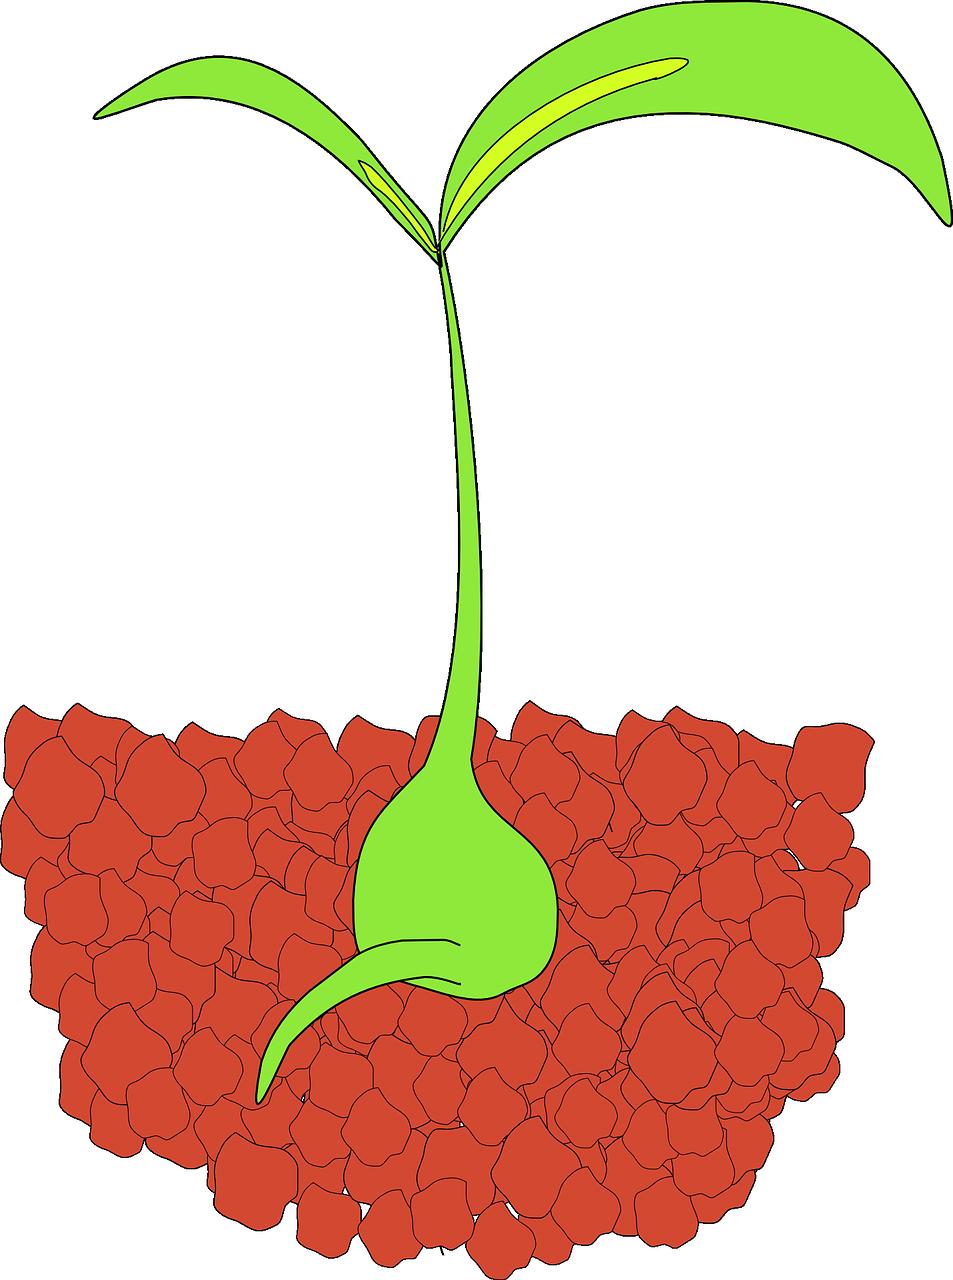 Apple seedling clipart png freeuse Virginians can begin ordering tree seedlings October 2 png freeuse